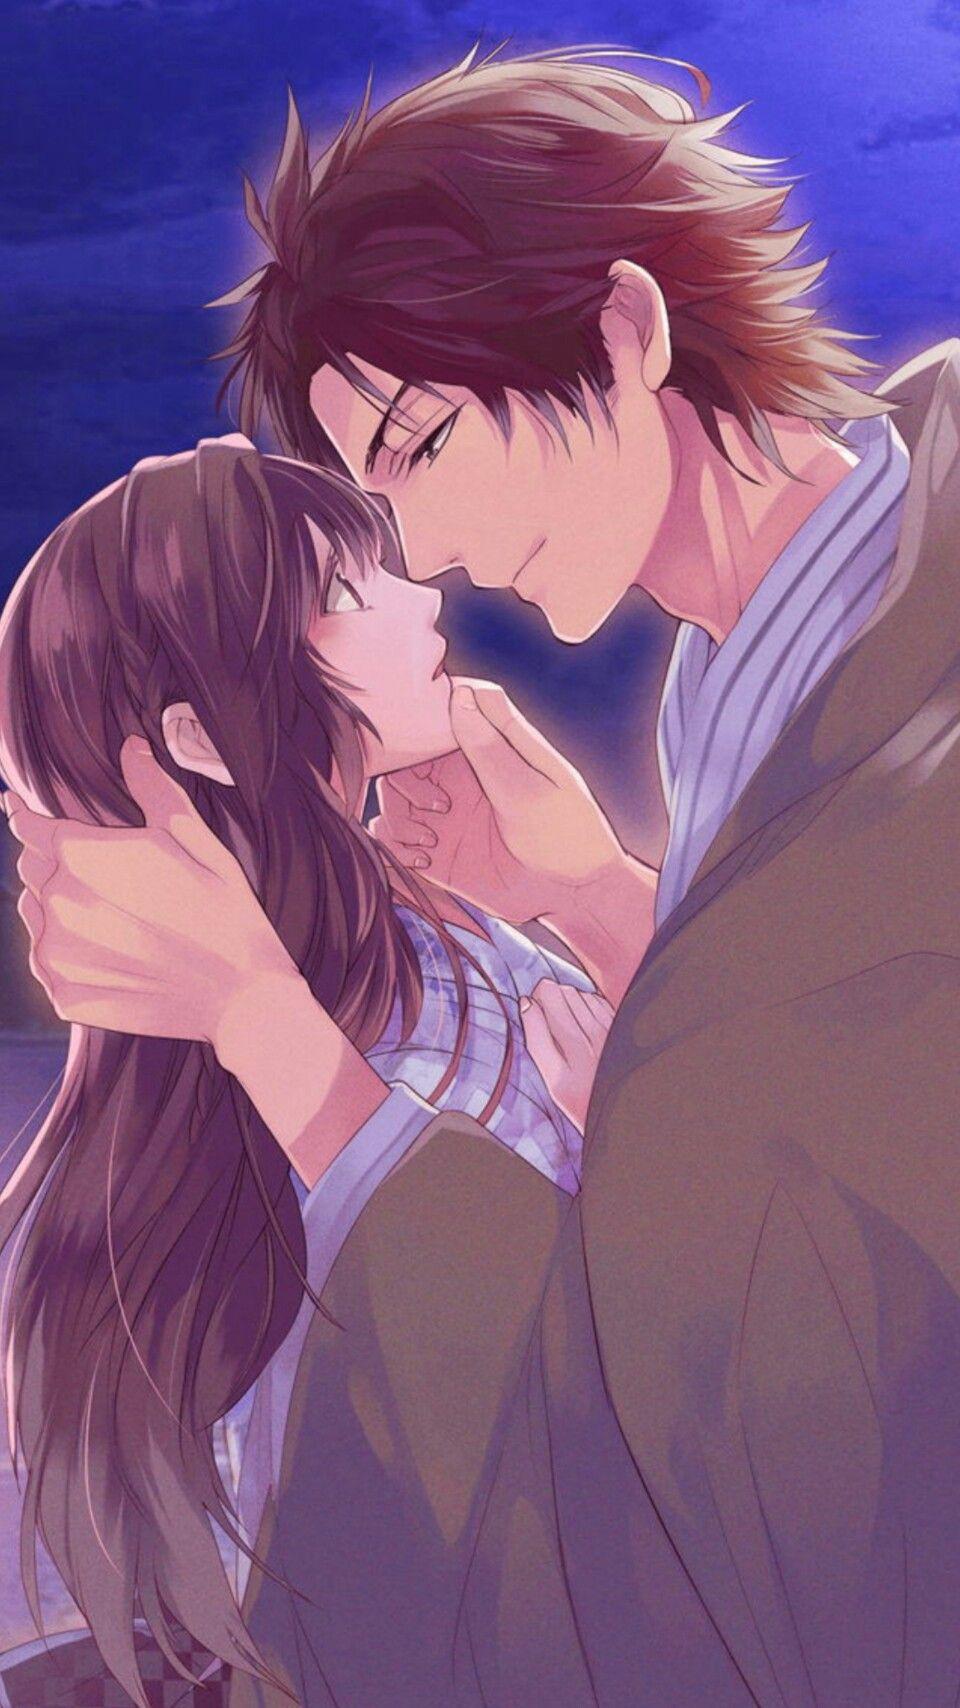 Shingen Dramatic Route Cg Romantic Anime Anime Love Couple Anime Love Story